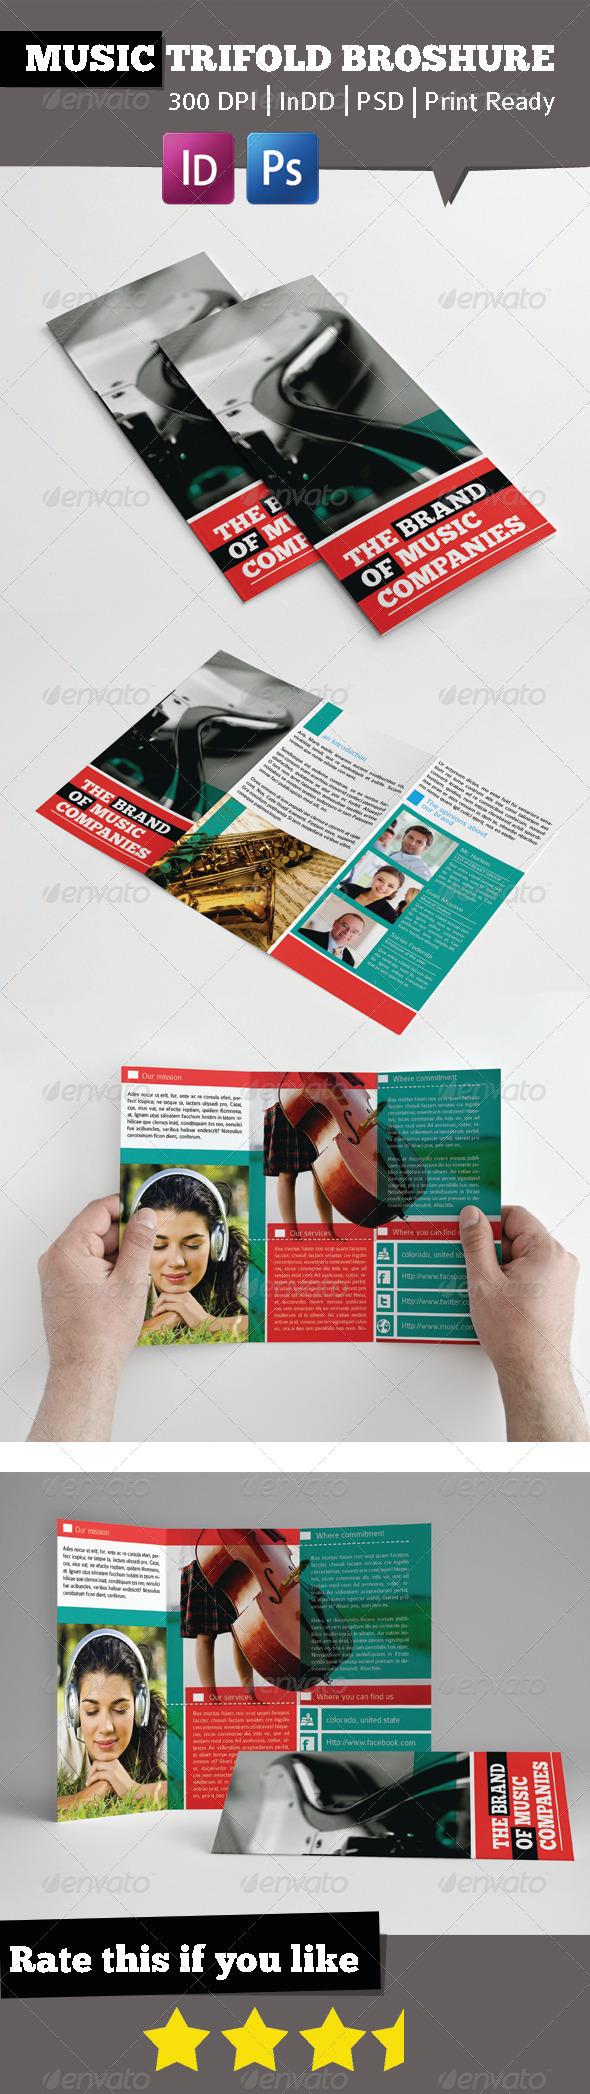 GraphicRiver Music Brand Trifold Broshure 5871432